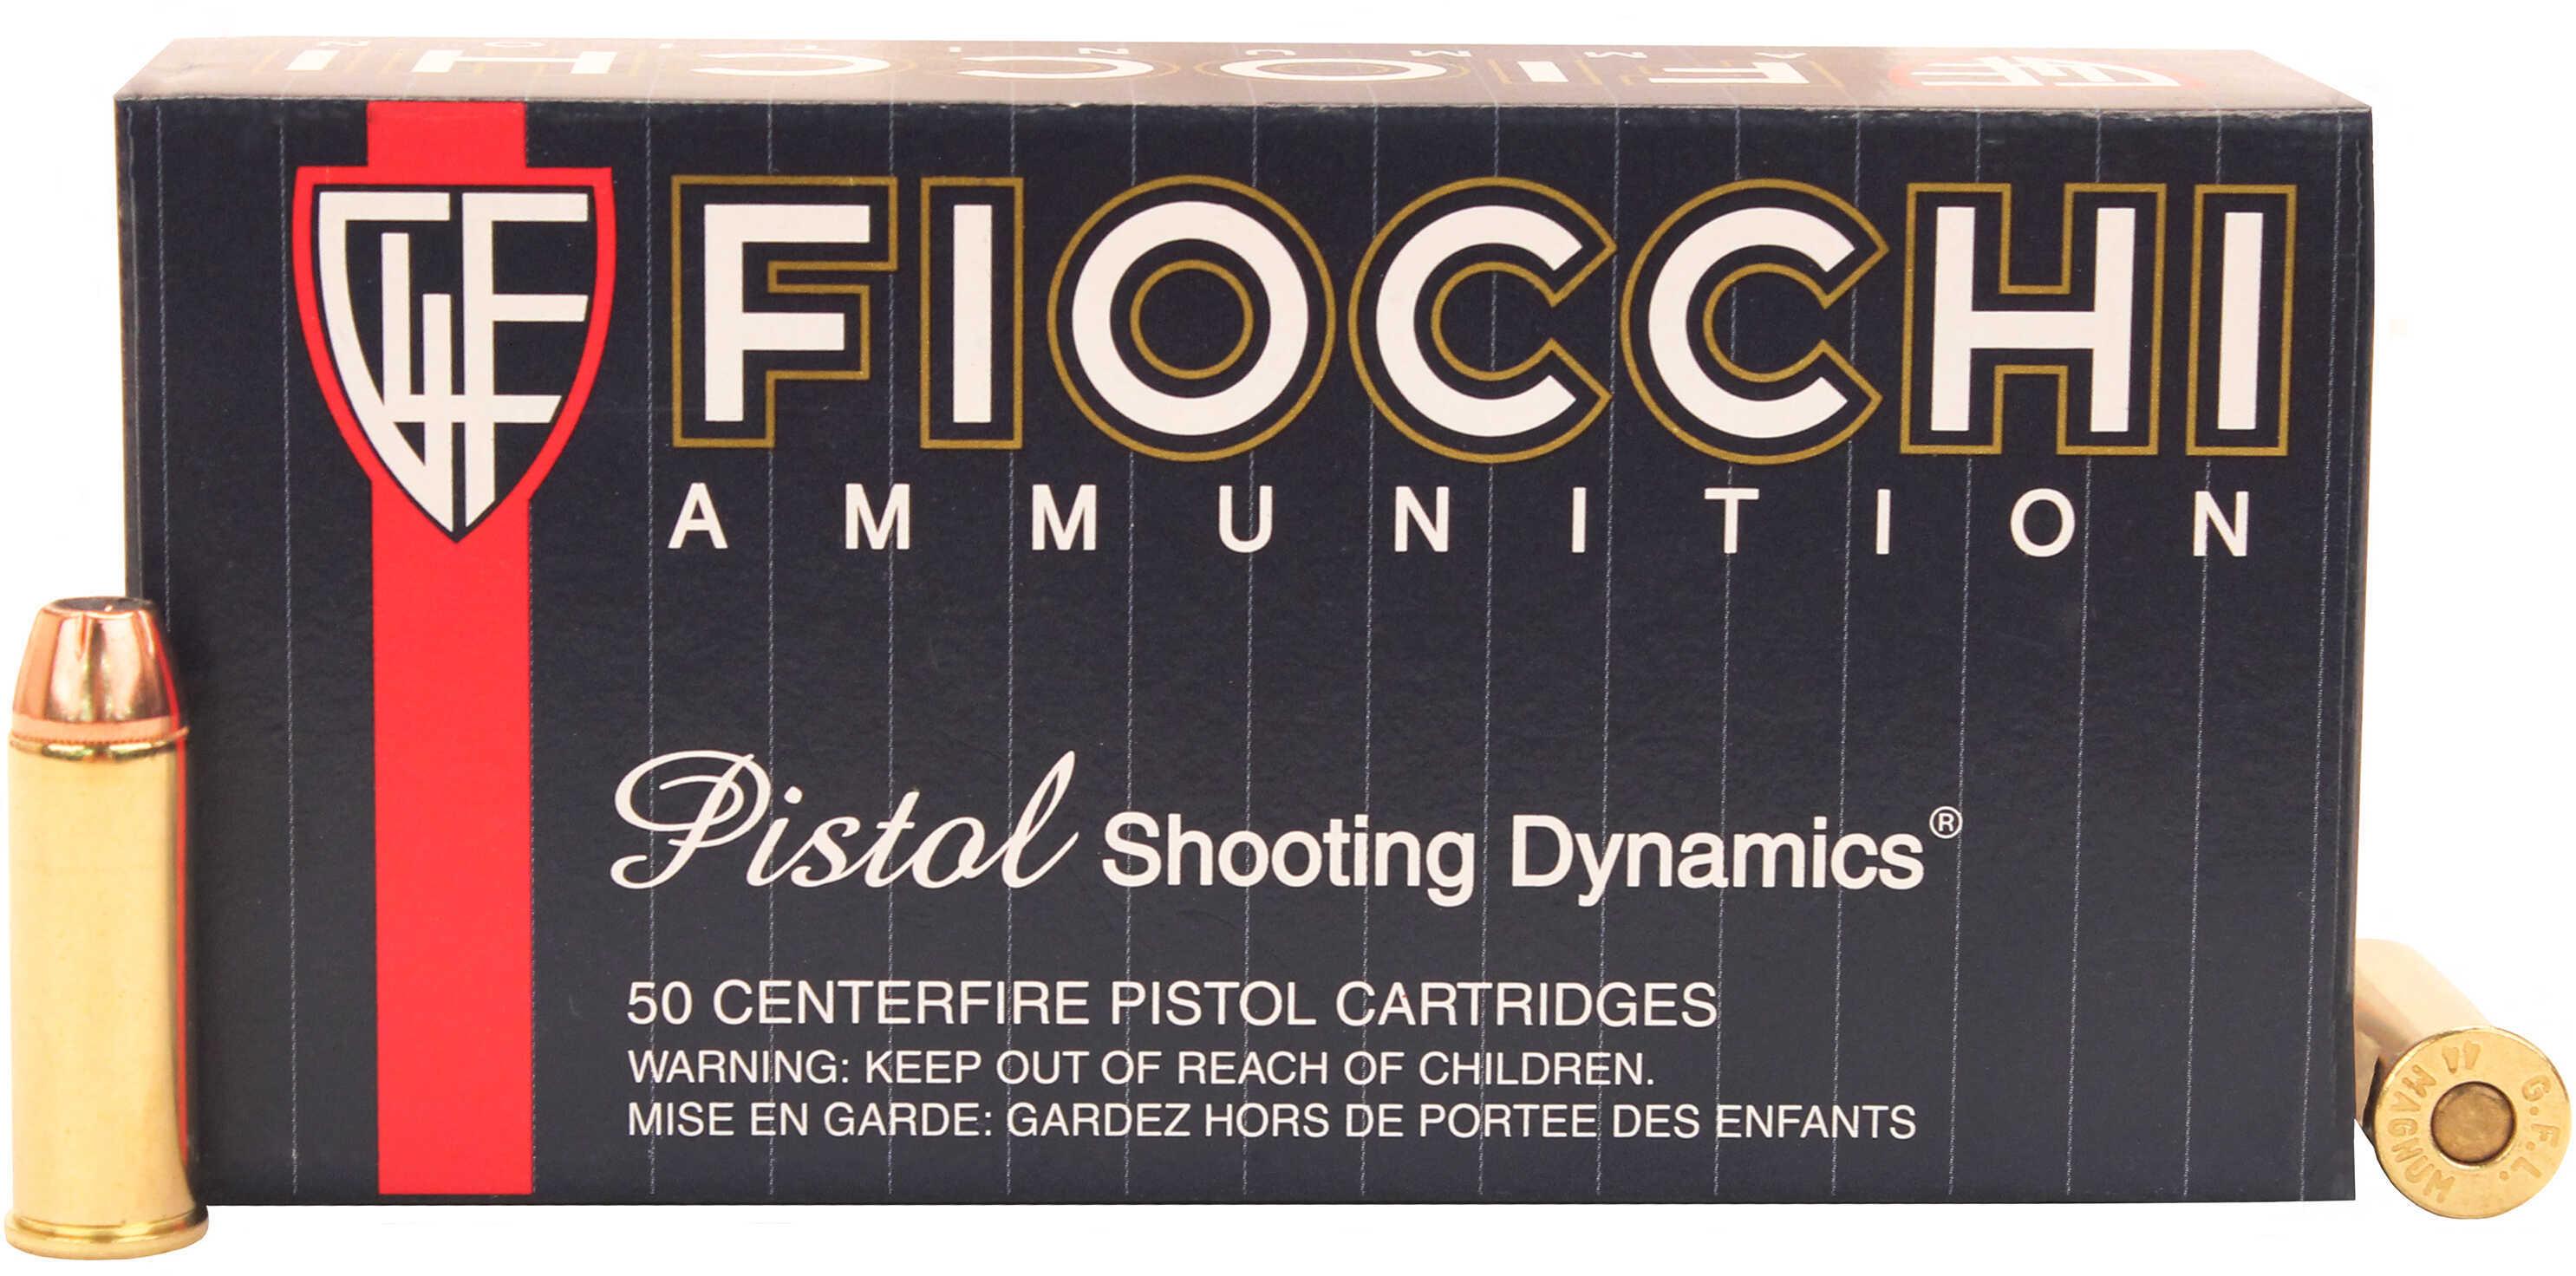 Fiocchi Ammo 44 Remington Magnum 200 Grains Semi-Jacketed Hollow Point SJHP Per 50 Md: 44B500